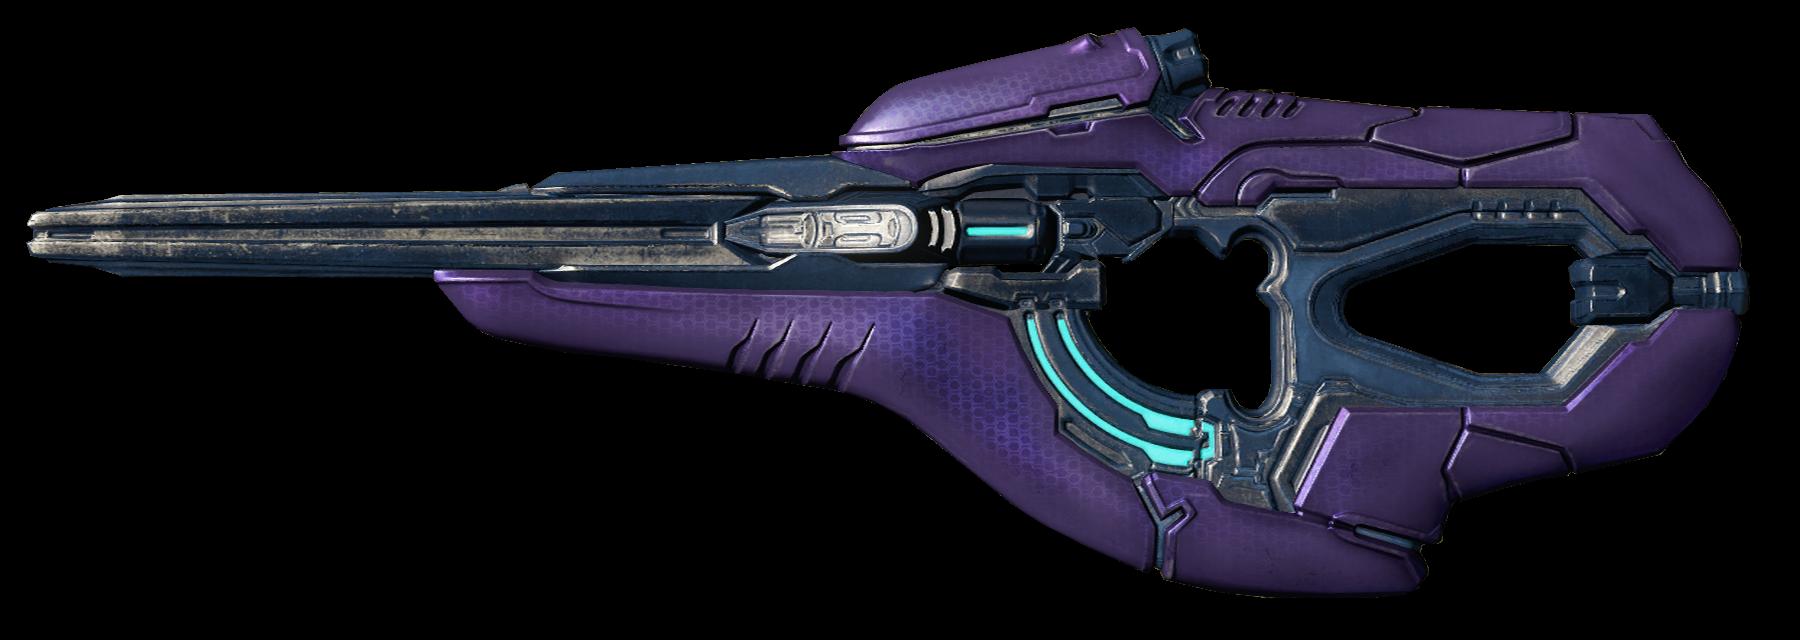 Covenant weapons   Darkmastera023'-s Halo Site!